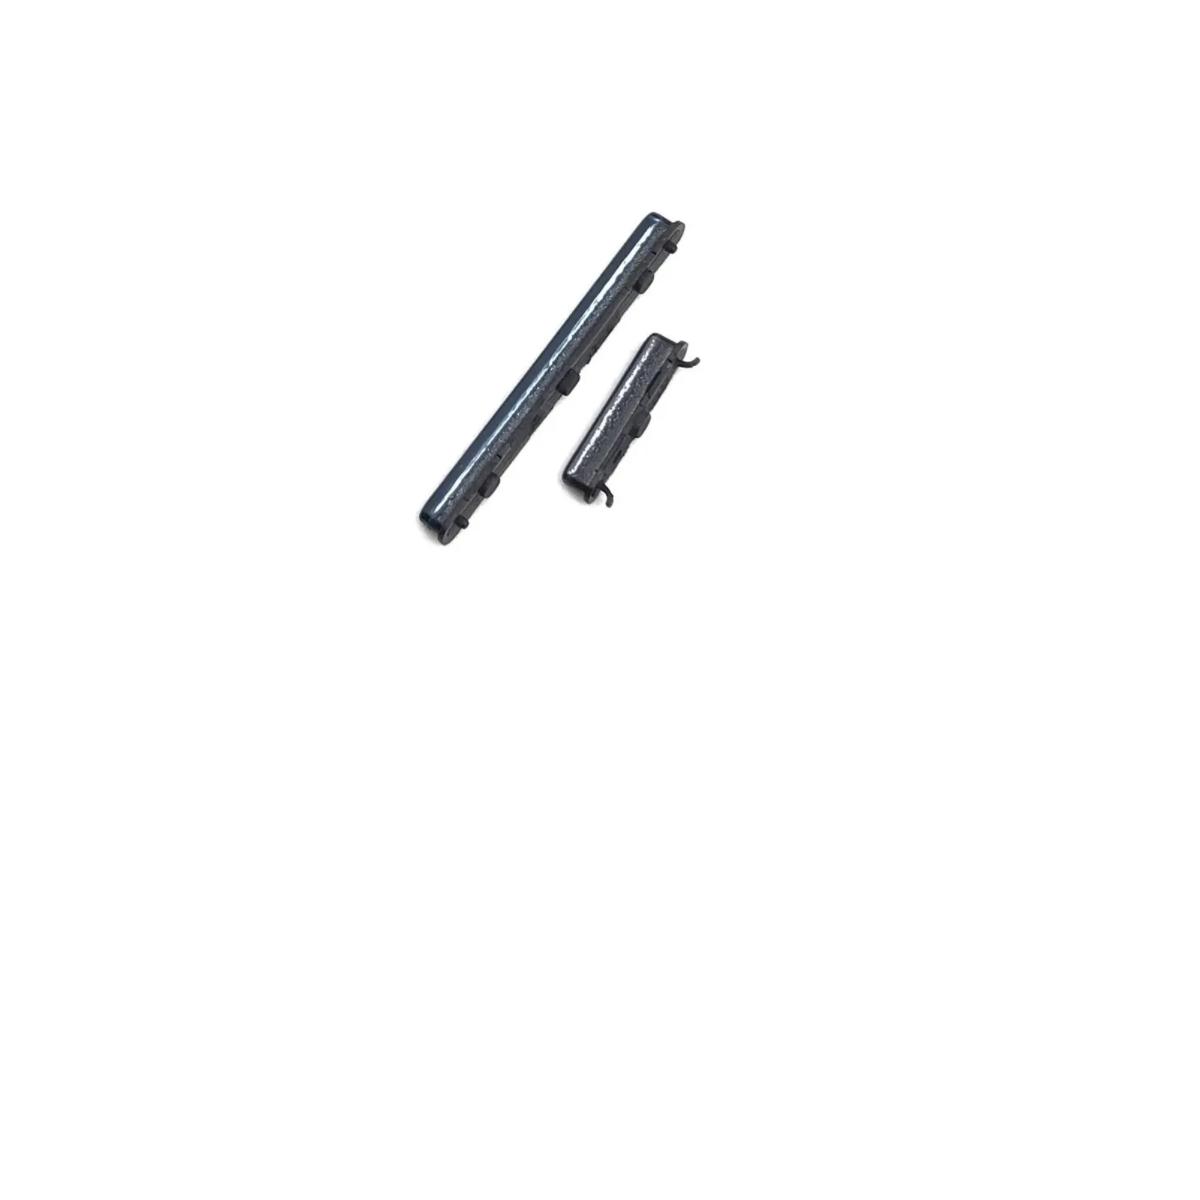 BOTAO POWER VOLUME EXTERNO KIT SAMSUNG GALAXY A31 SM-A315 PRETO RETIRADA